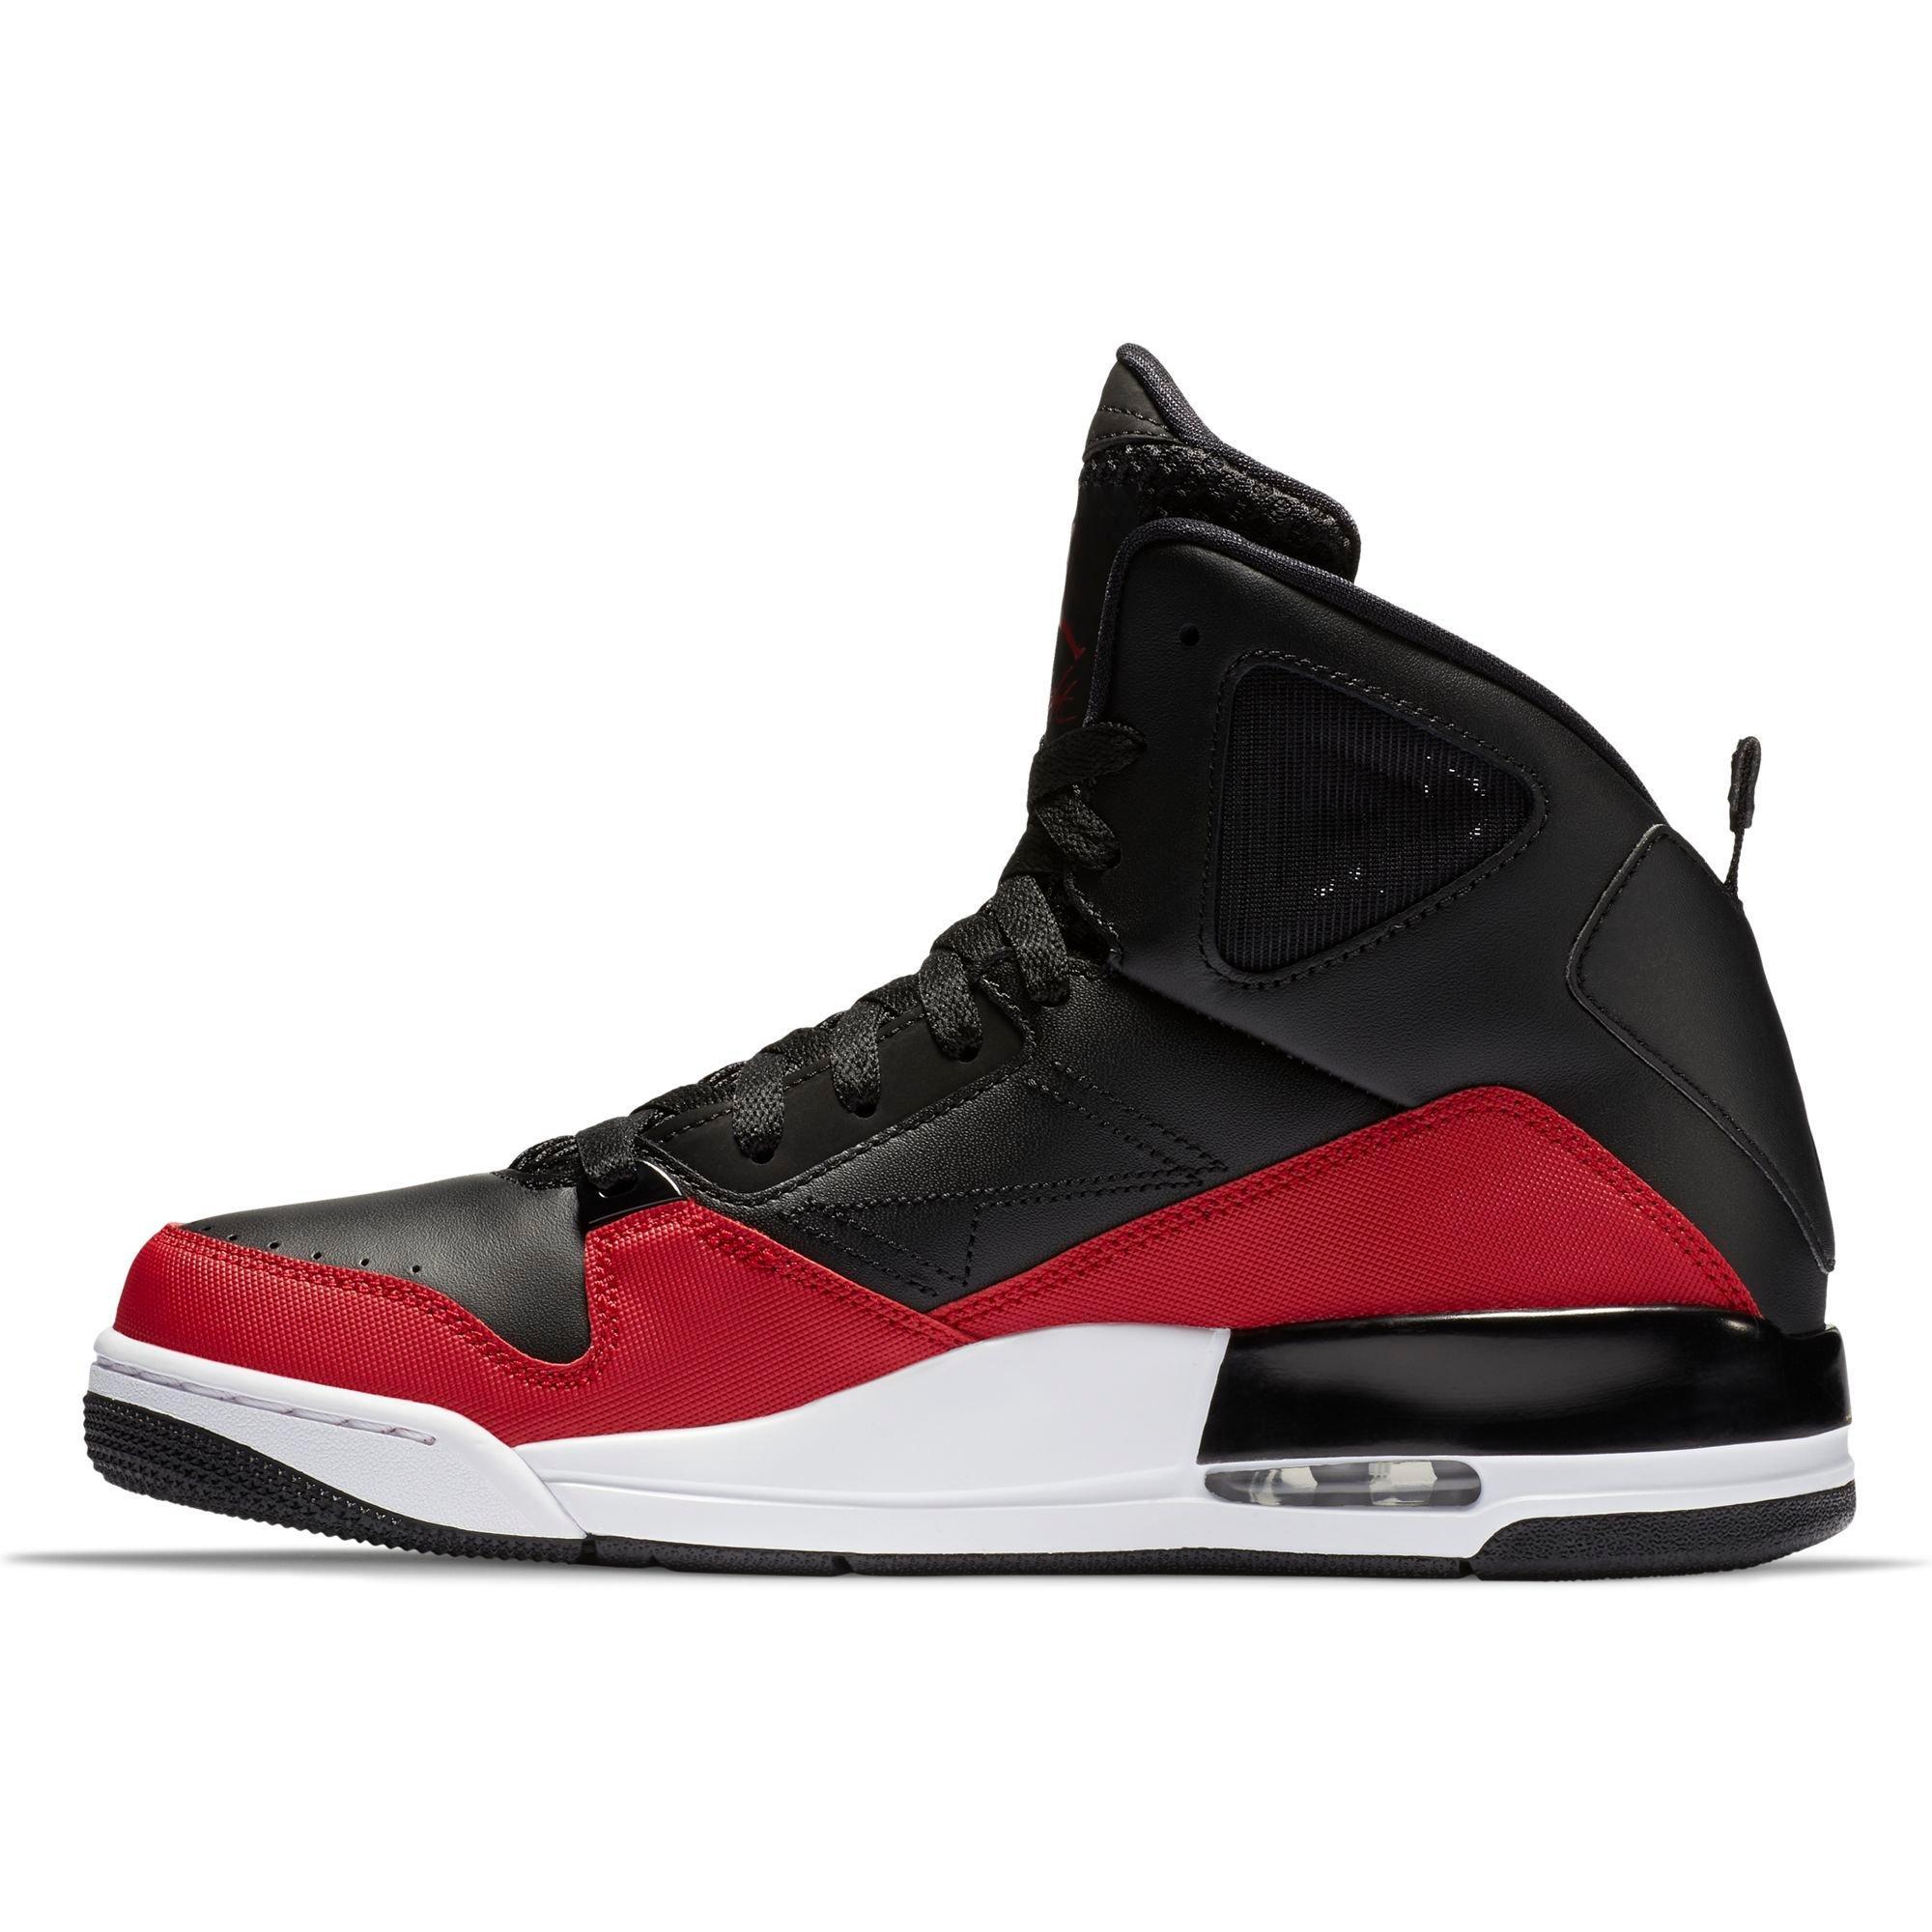 competitive price 86e15 fecec release date jordan sc 2 red grey 673a9 90874